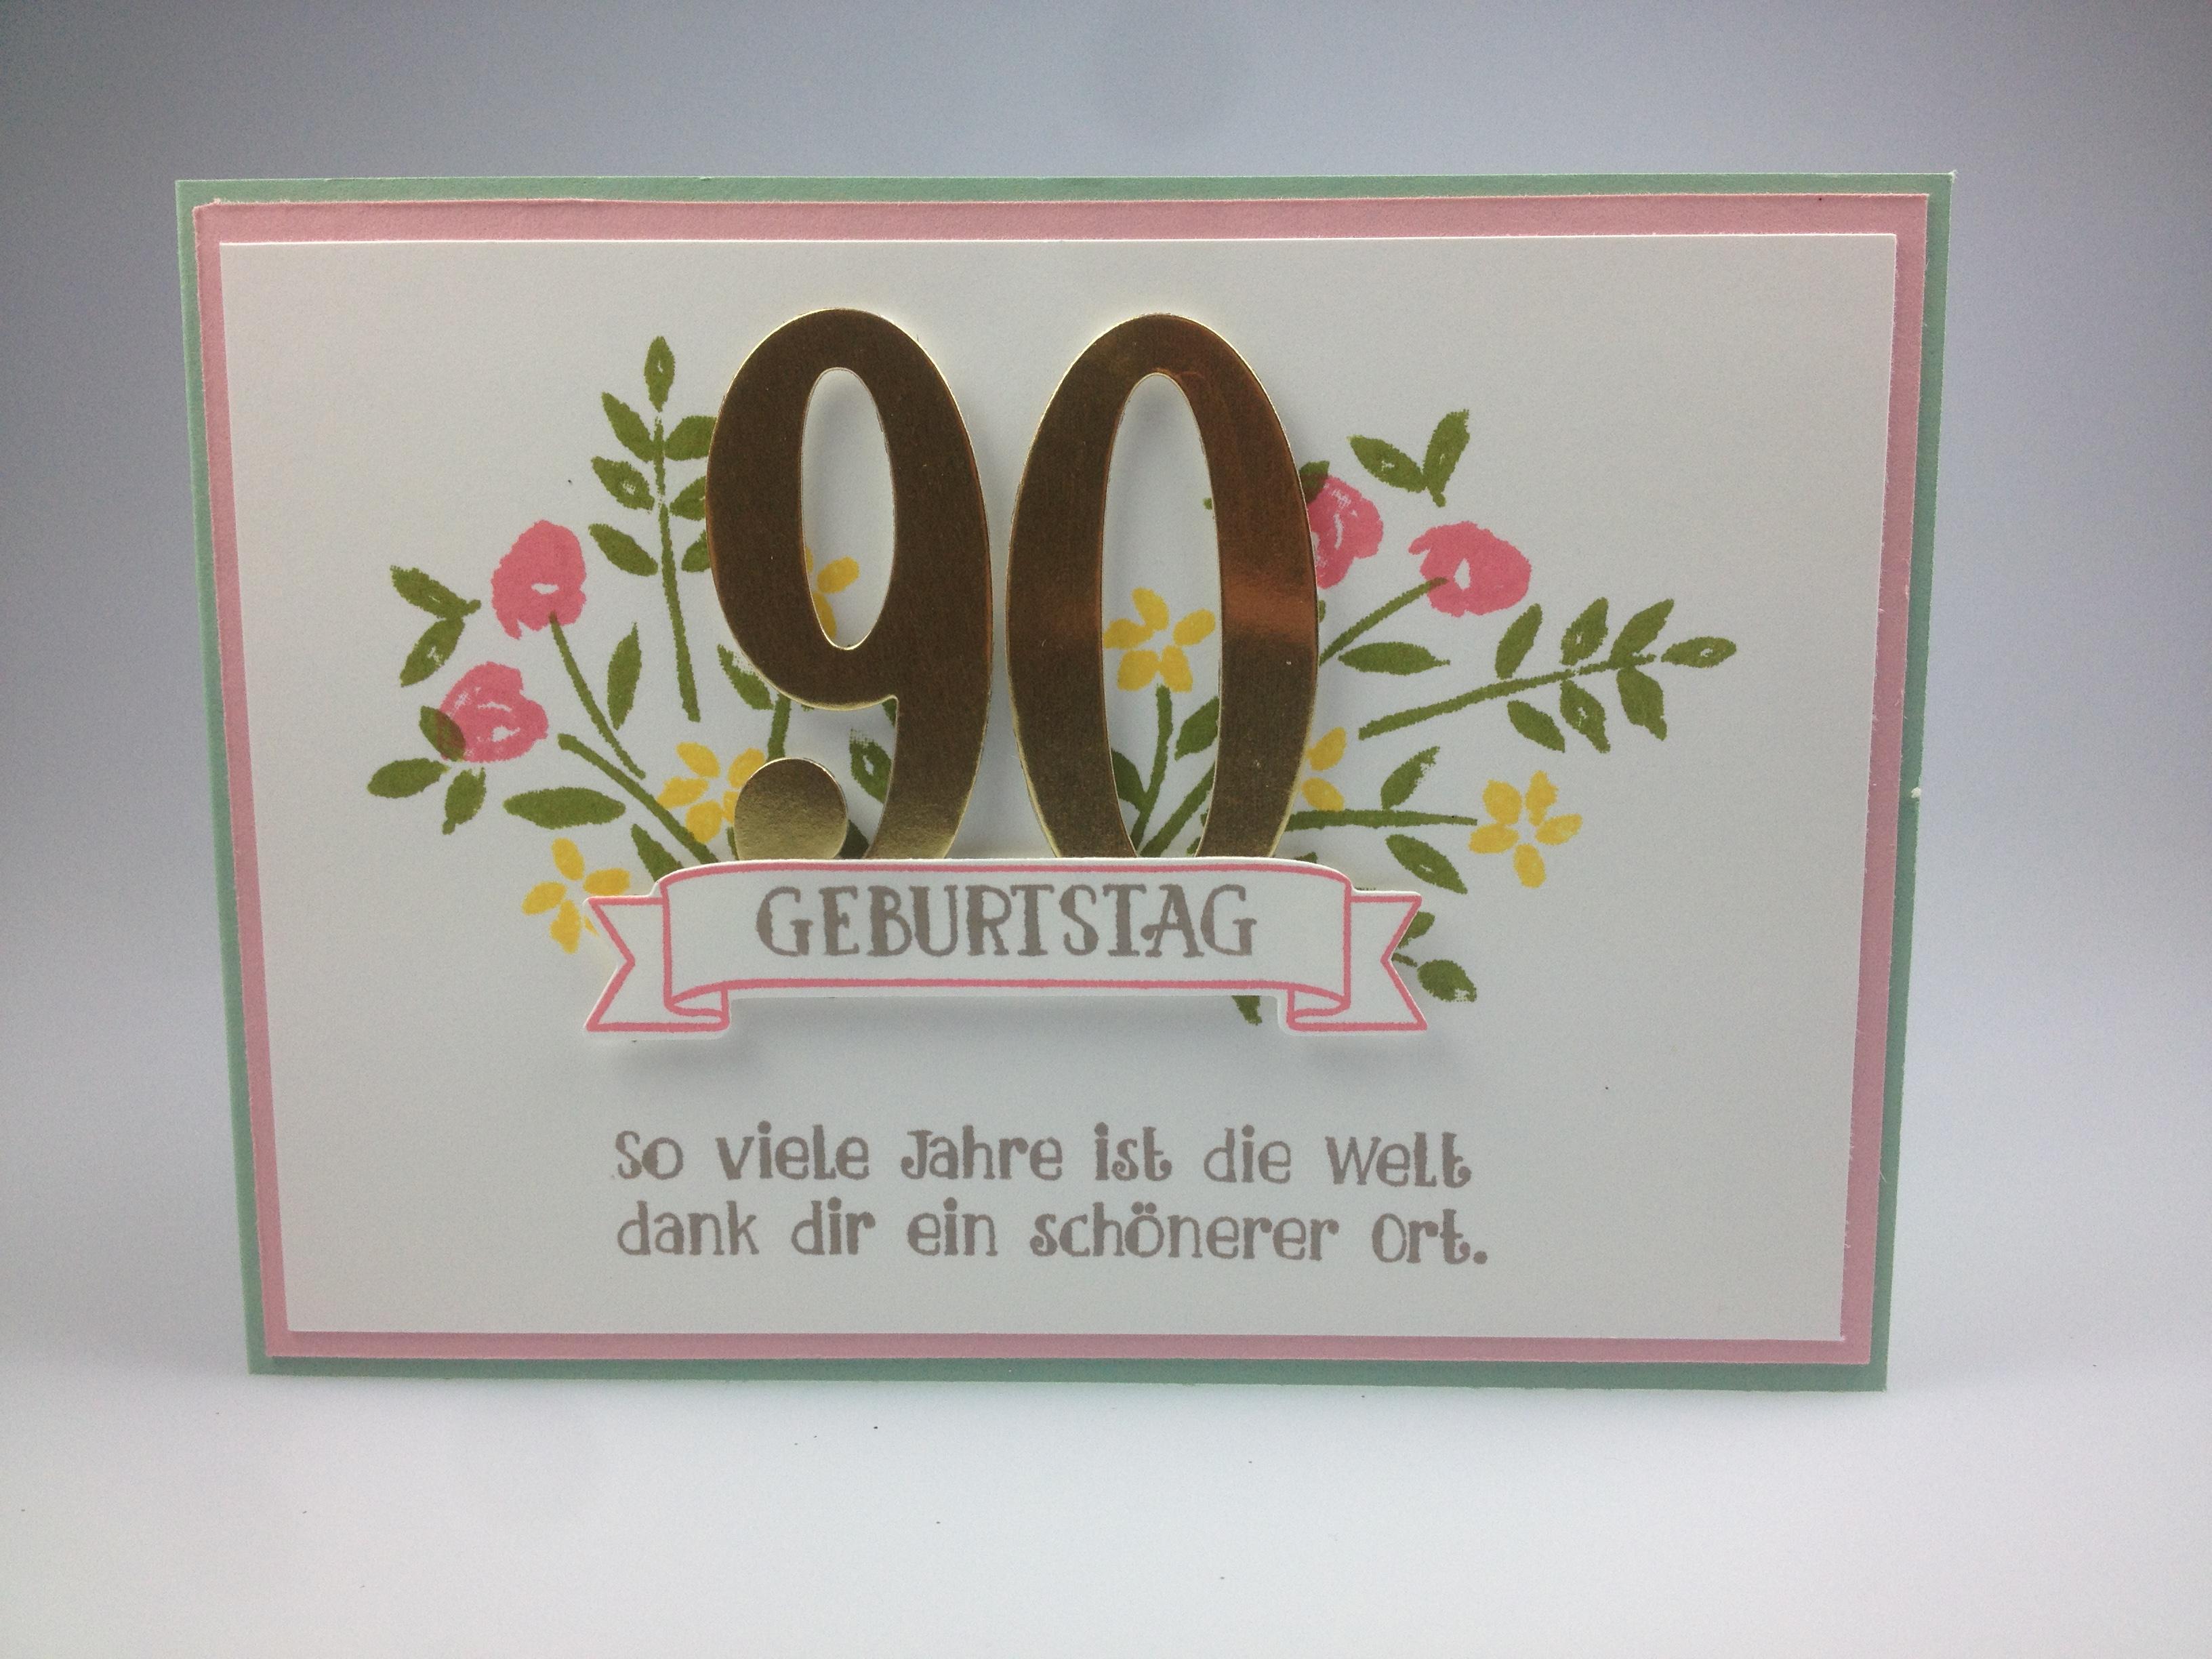 Zum 90 Geburtstag